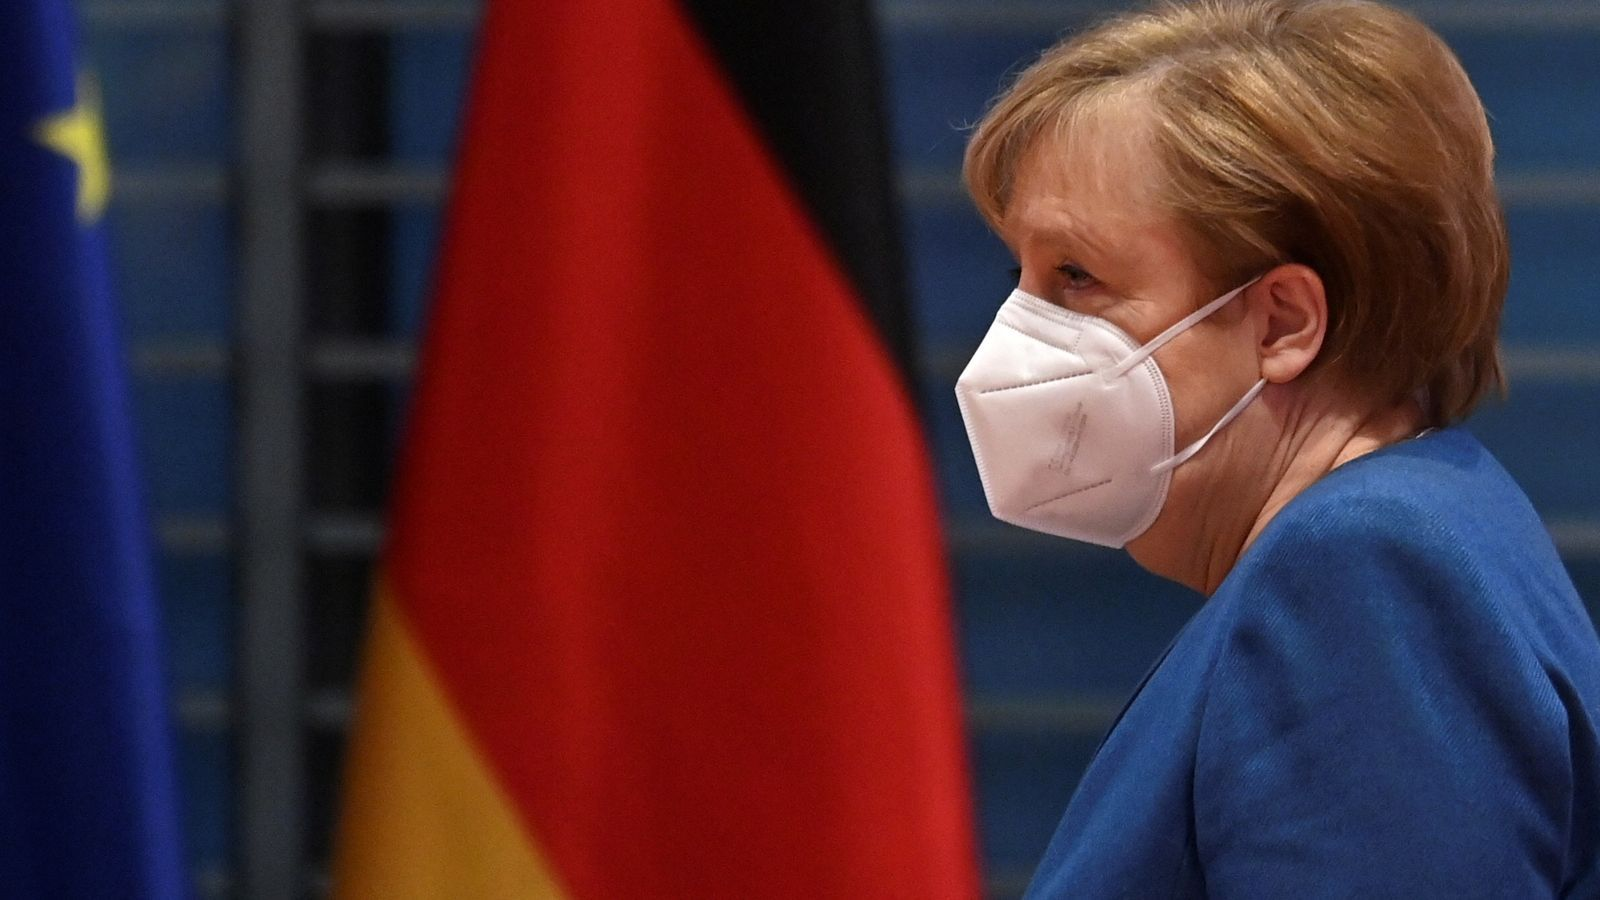 La cancellera alemanya, Angela Merkel